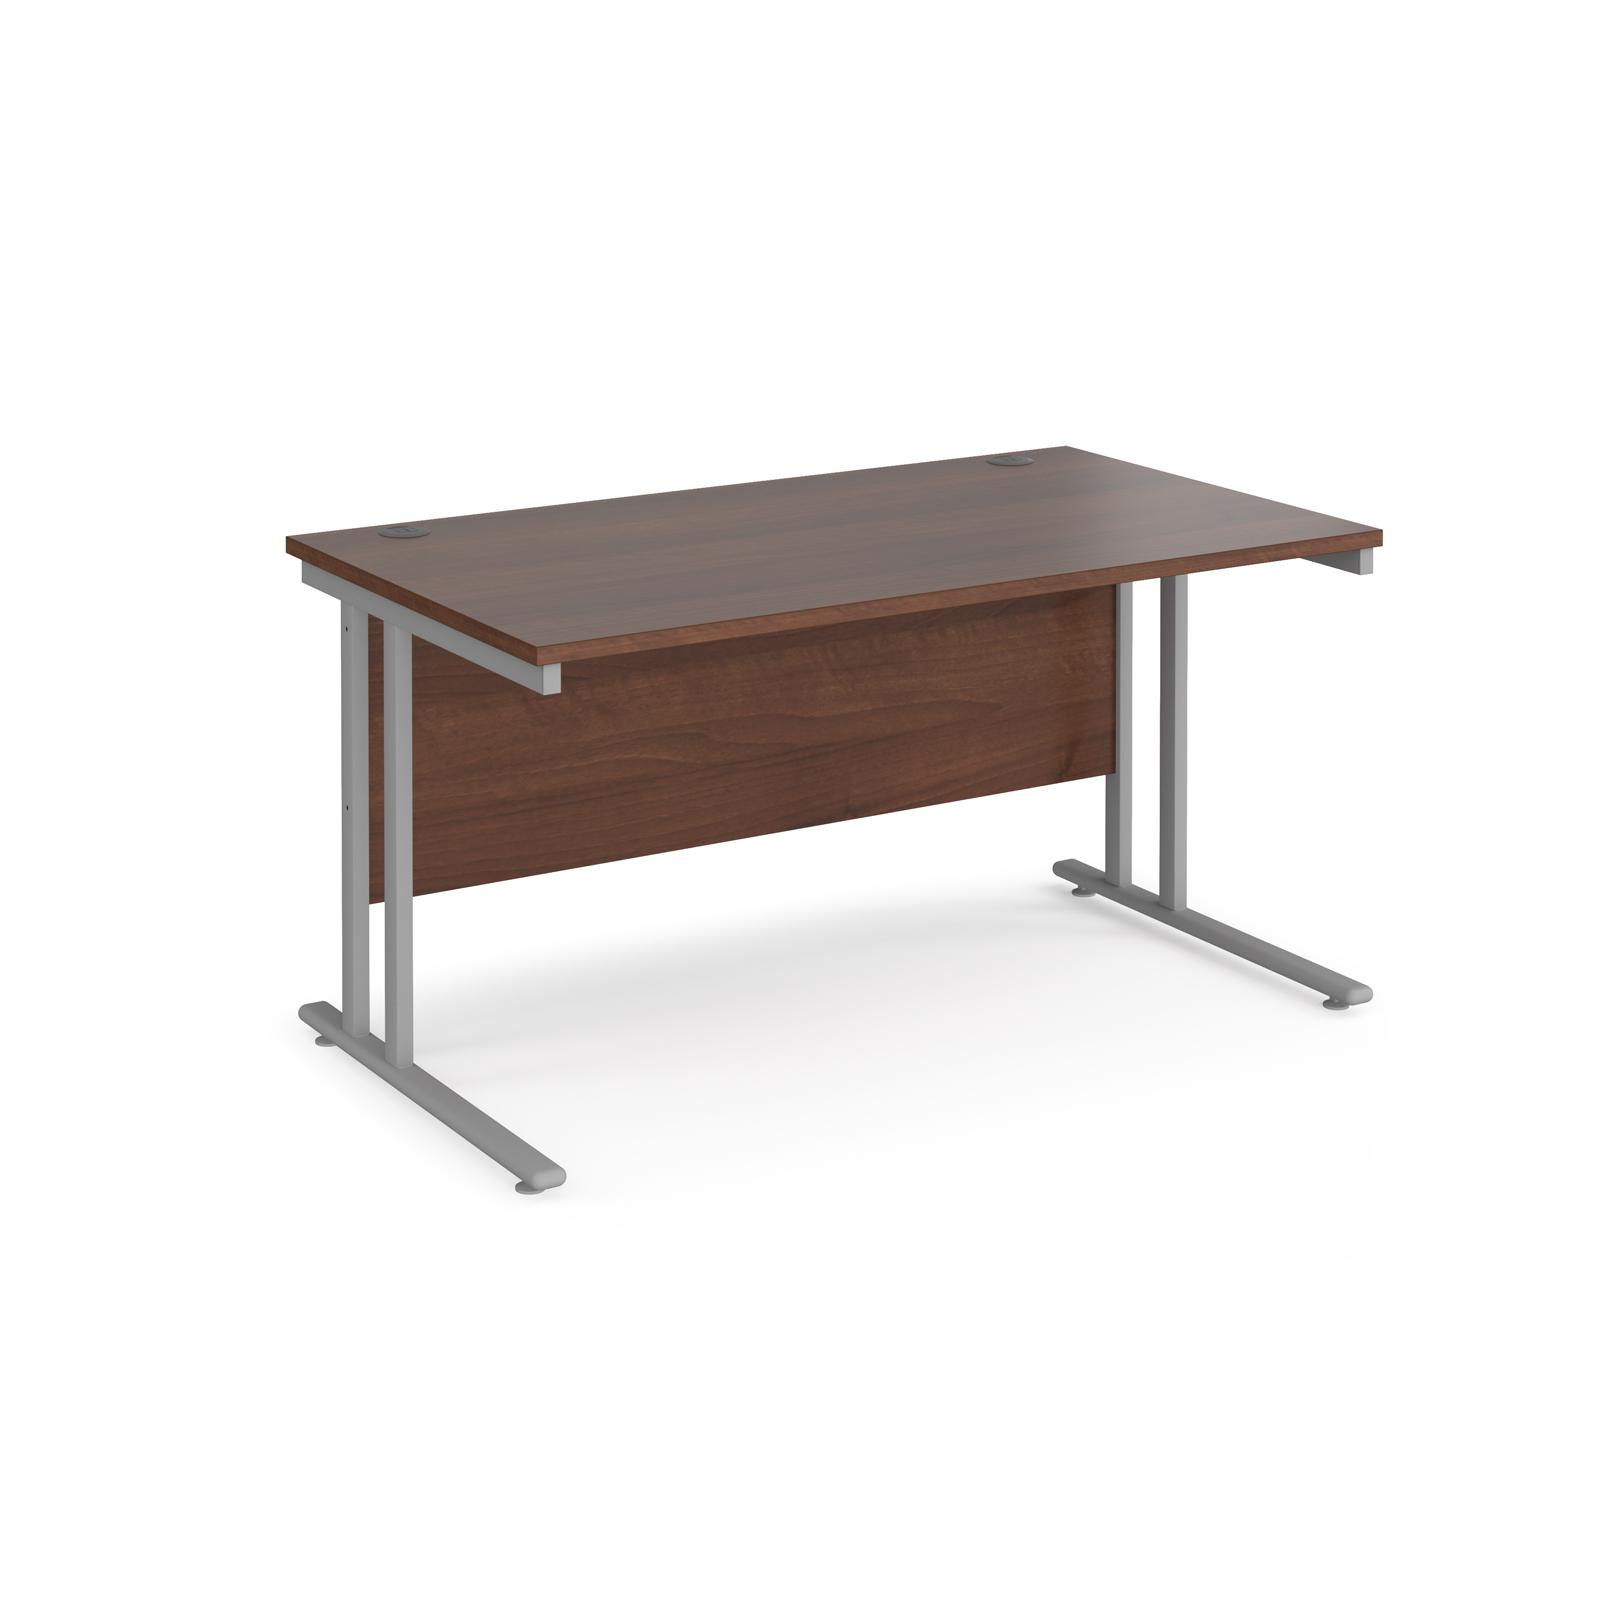 Rectangular Desks Maestro 25 straight desk 1400mm x 800mm - silver cantilever leg frame, walnut top